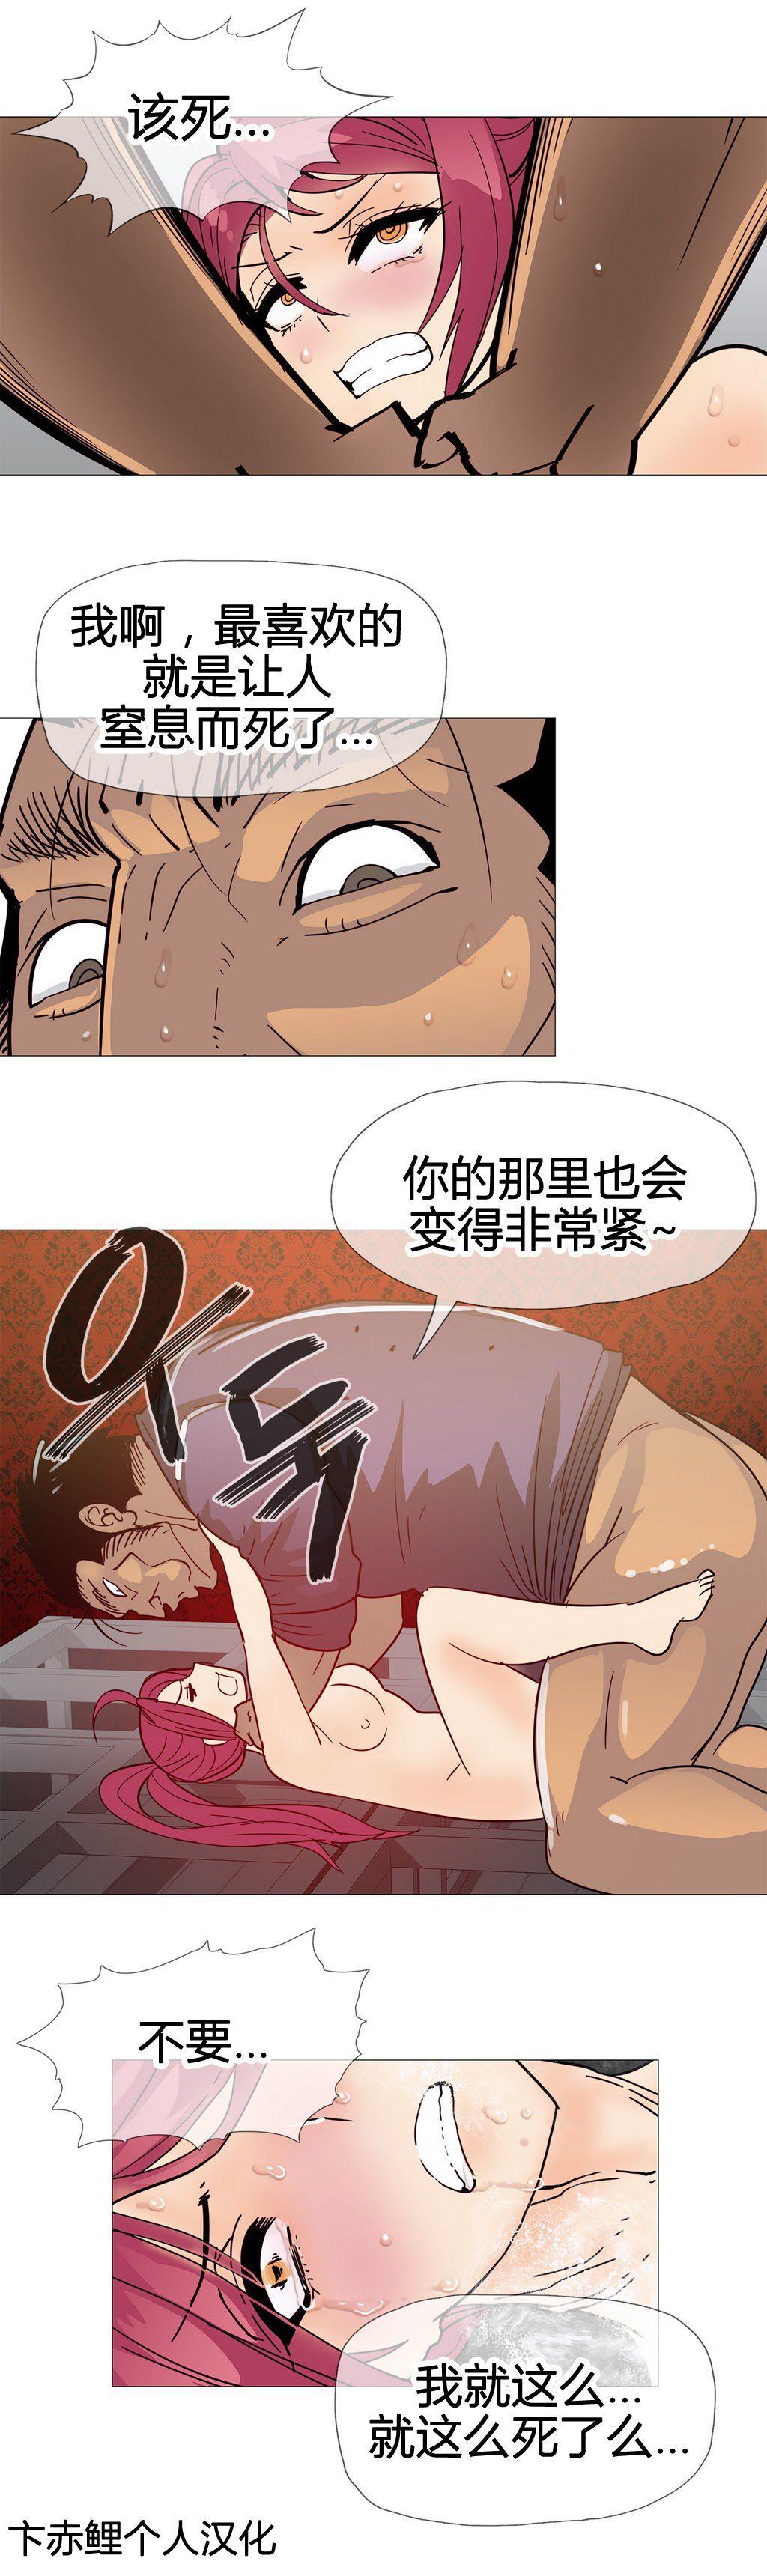 HouseHold Affairs 【卞赤鲤汉化】1~15话 206